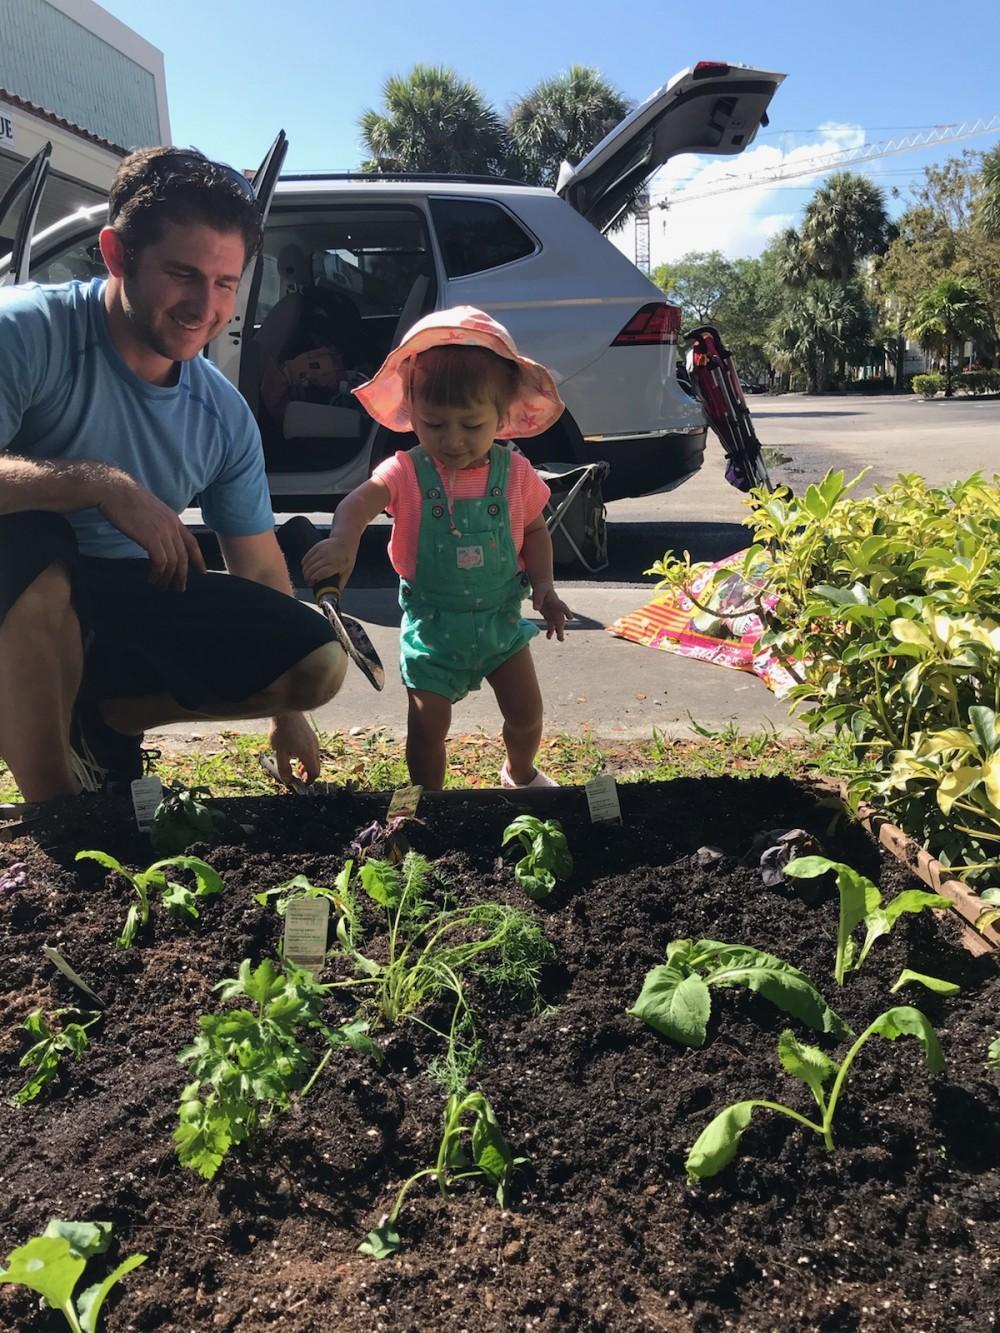 Dr. Elan and his daughter Amelia planting a garden